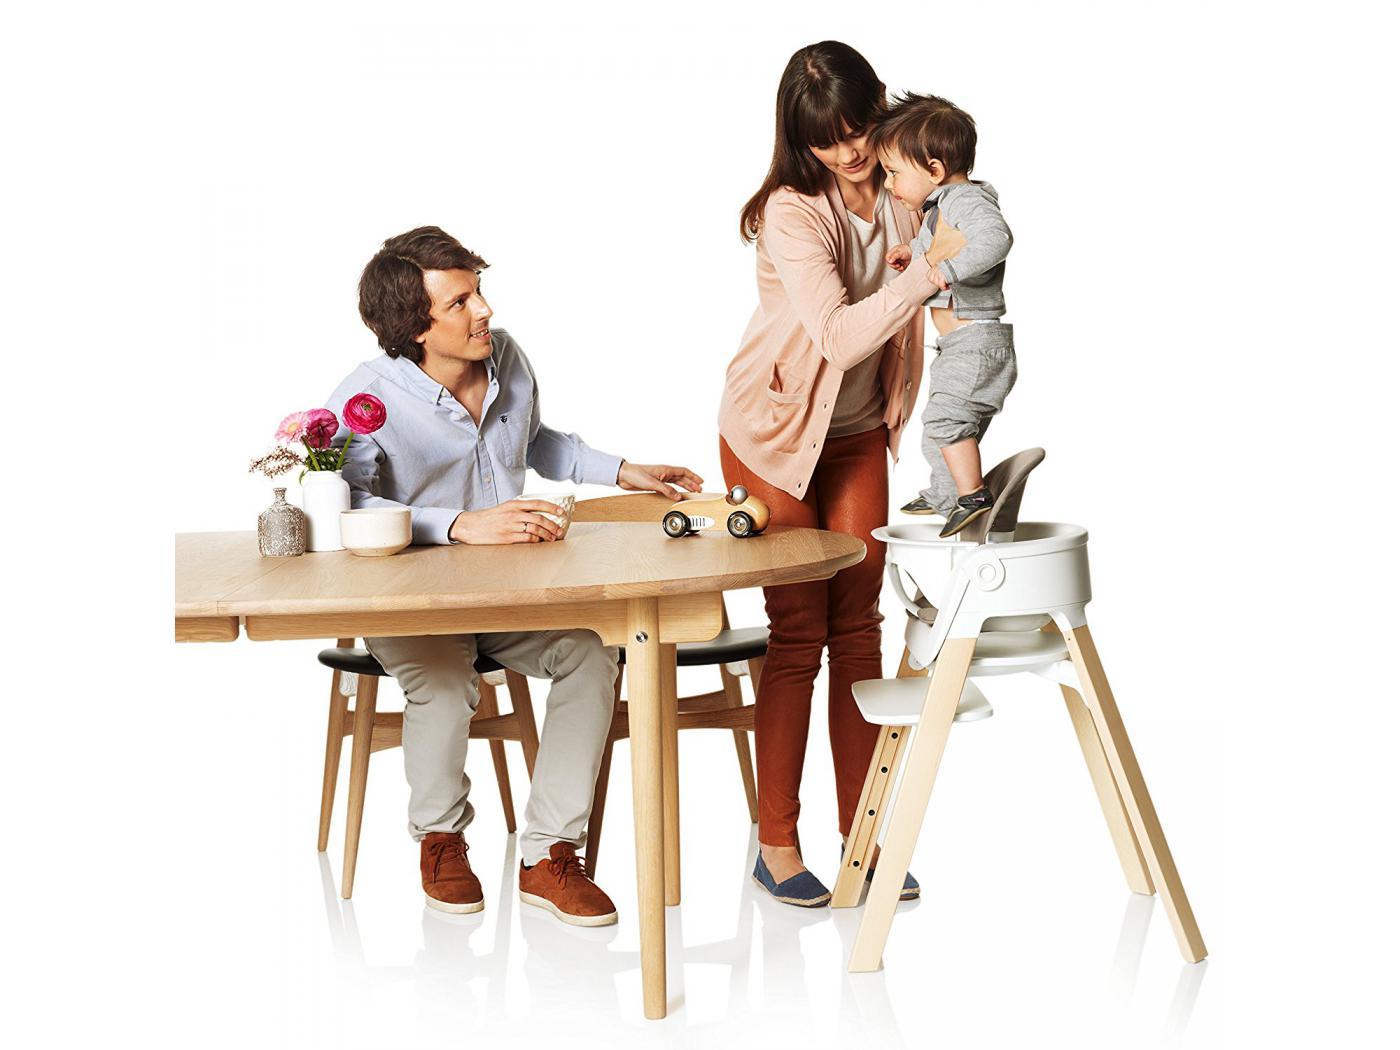 stokke baby set blanc pour chaise haute steps. Black Bedroom Furniture Sets. Home Design Ideas